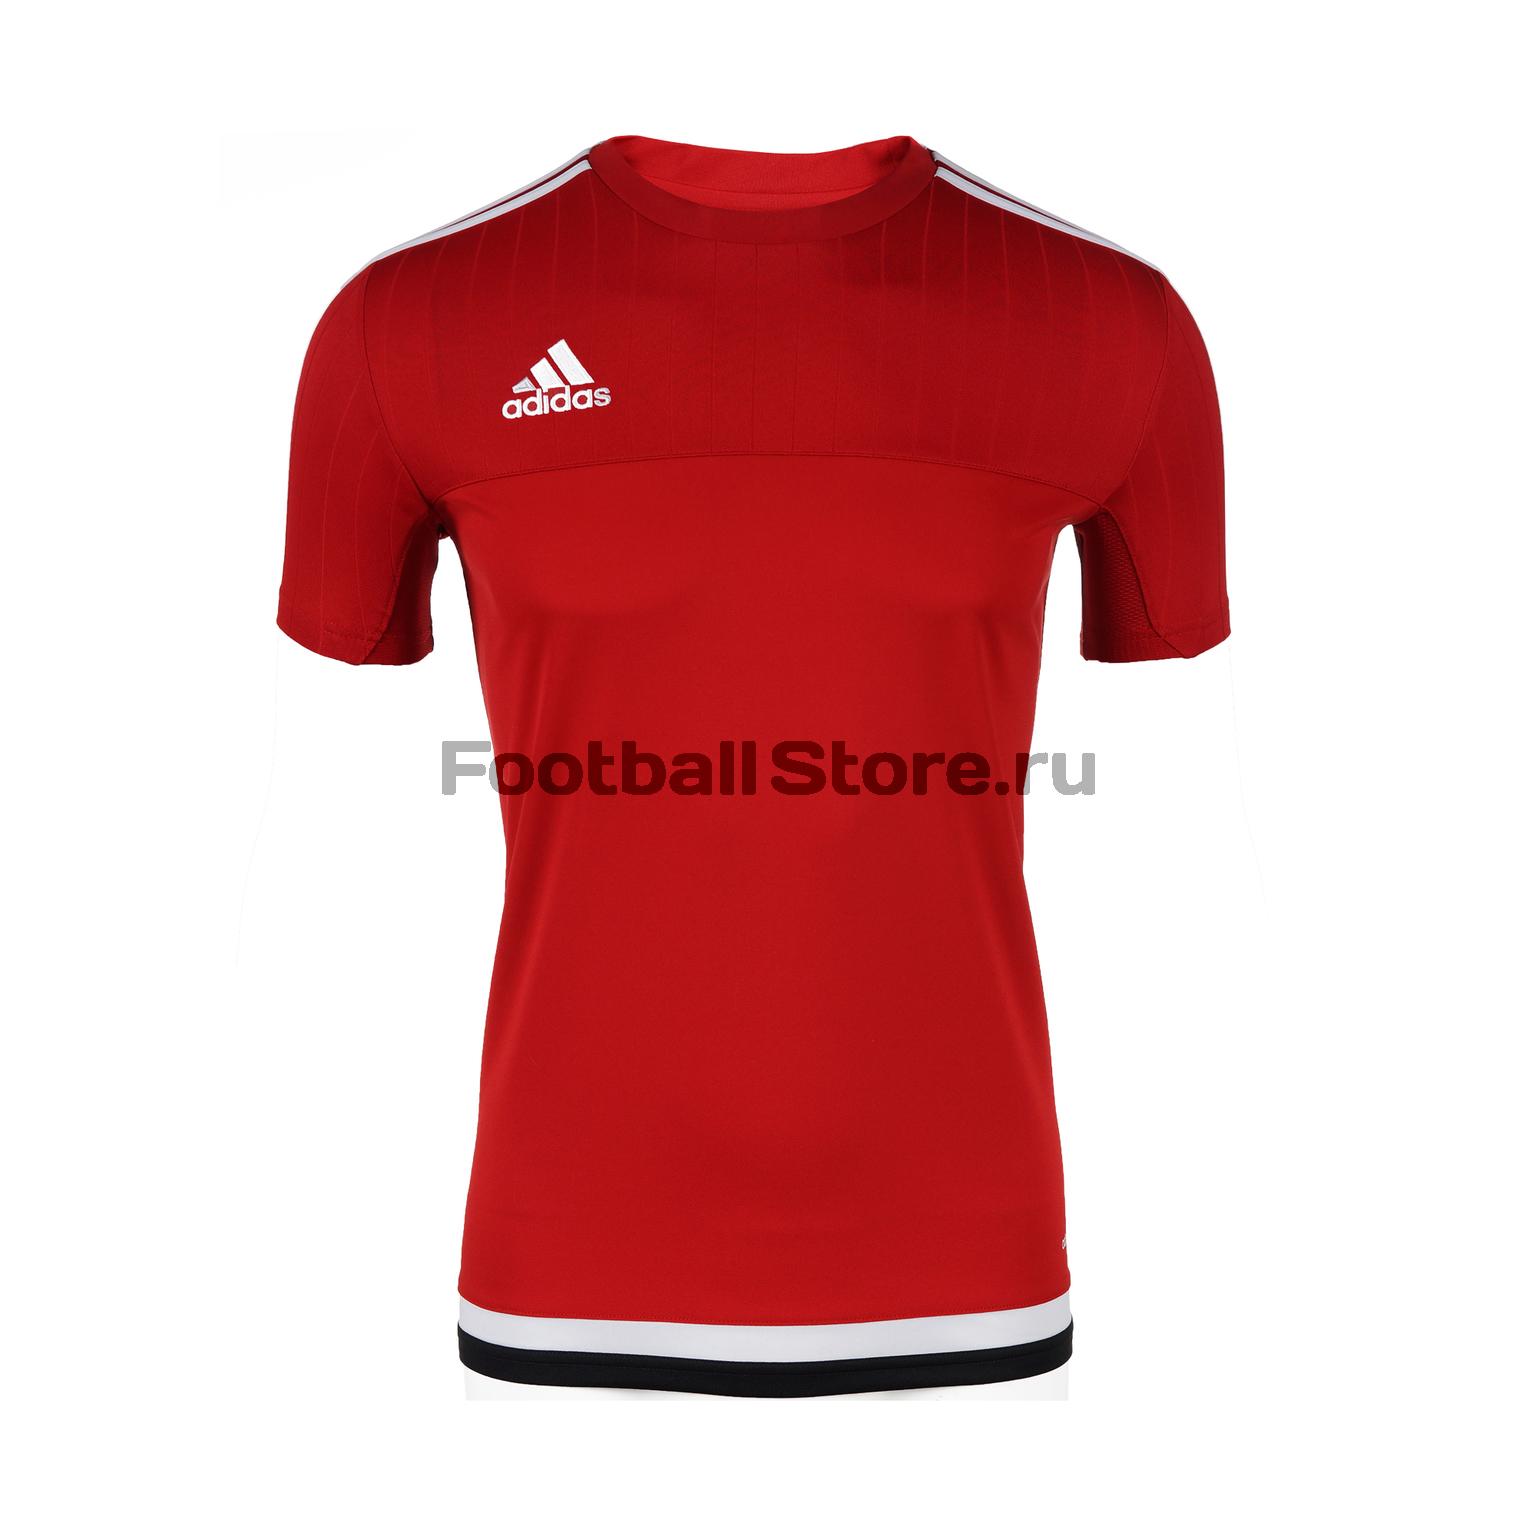 Футболка Adidas Tiro15 TRG JS M64061